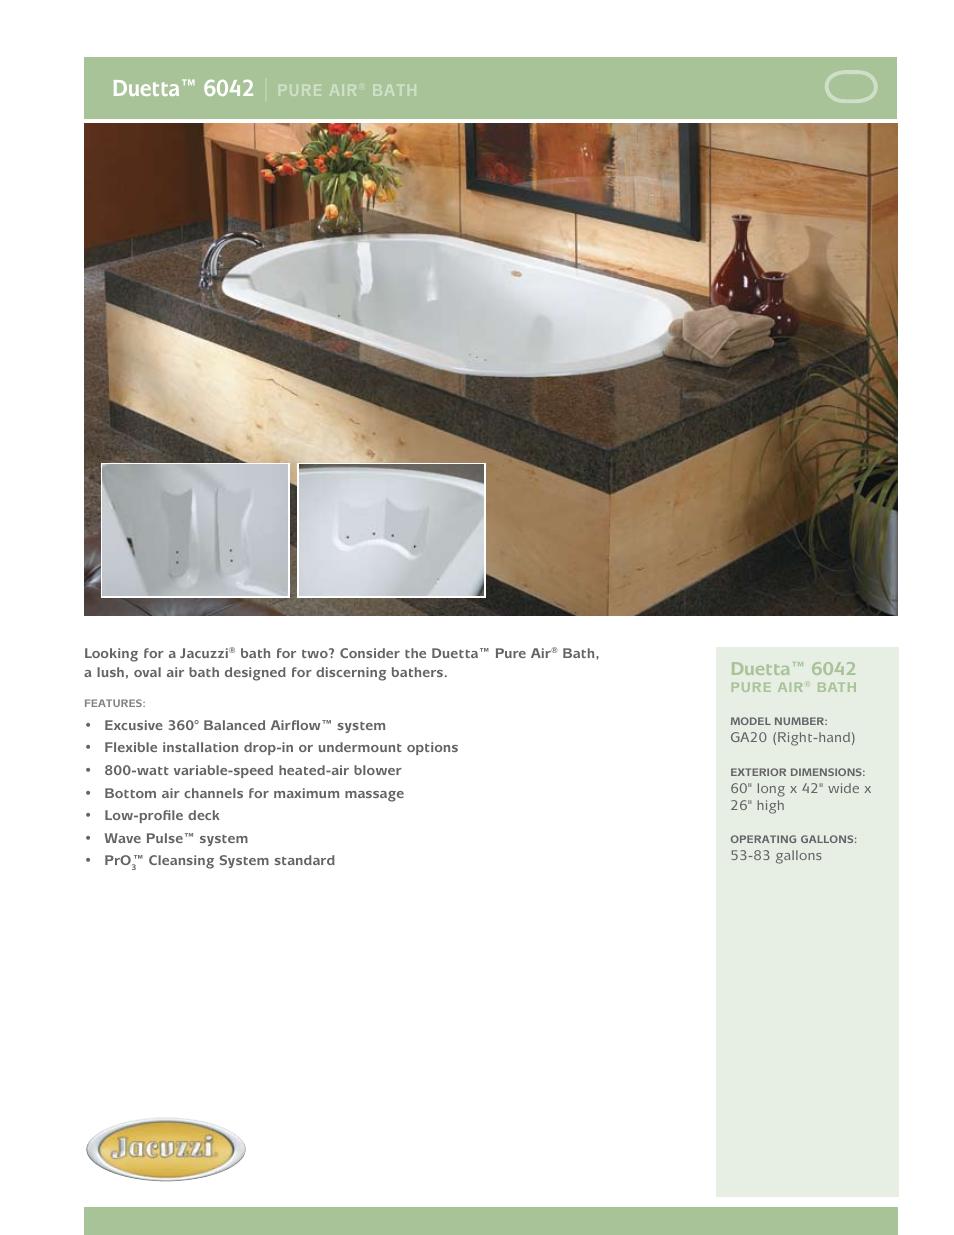 Jacuzzi Duetta 6042 Pure Air Bath GA20 User Manual | 2 pages